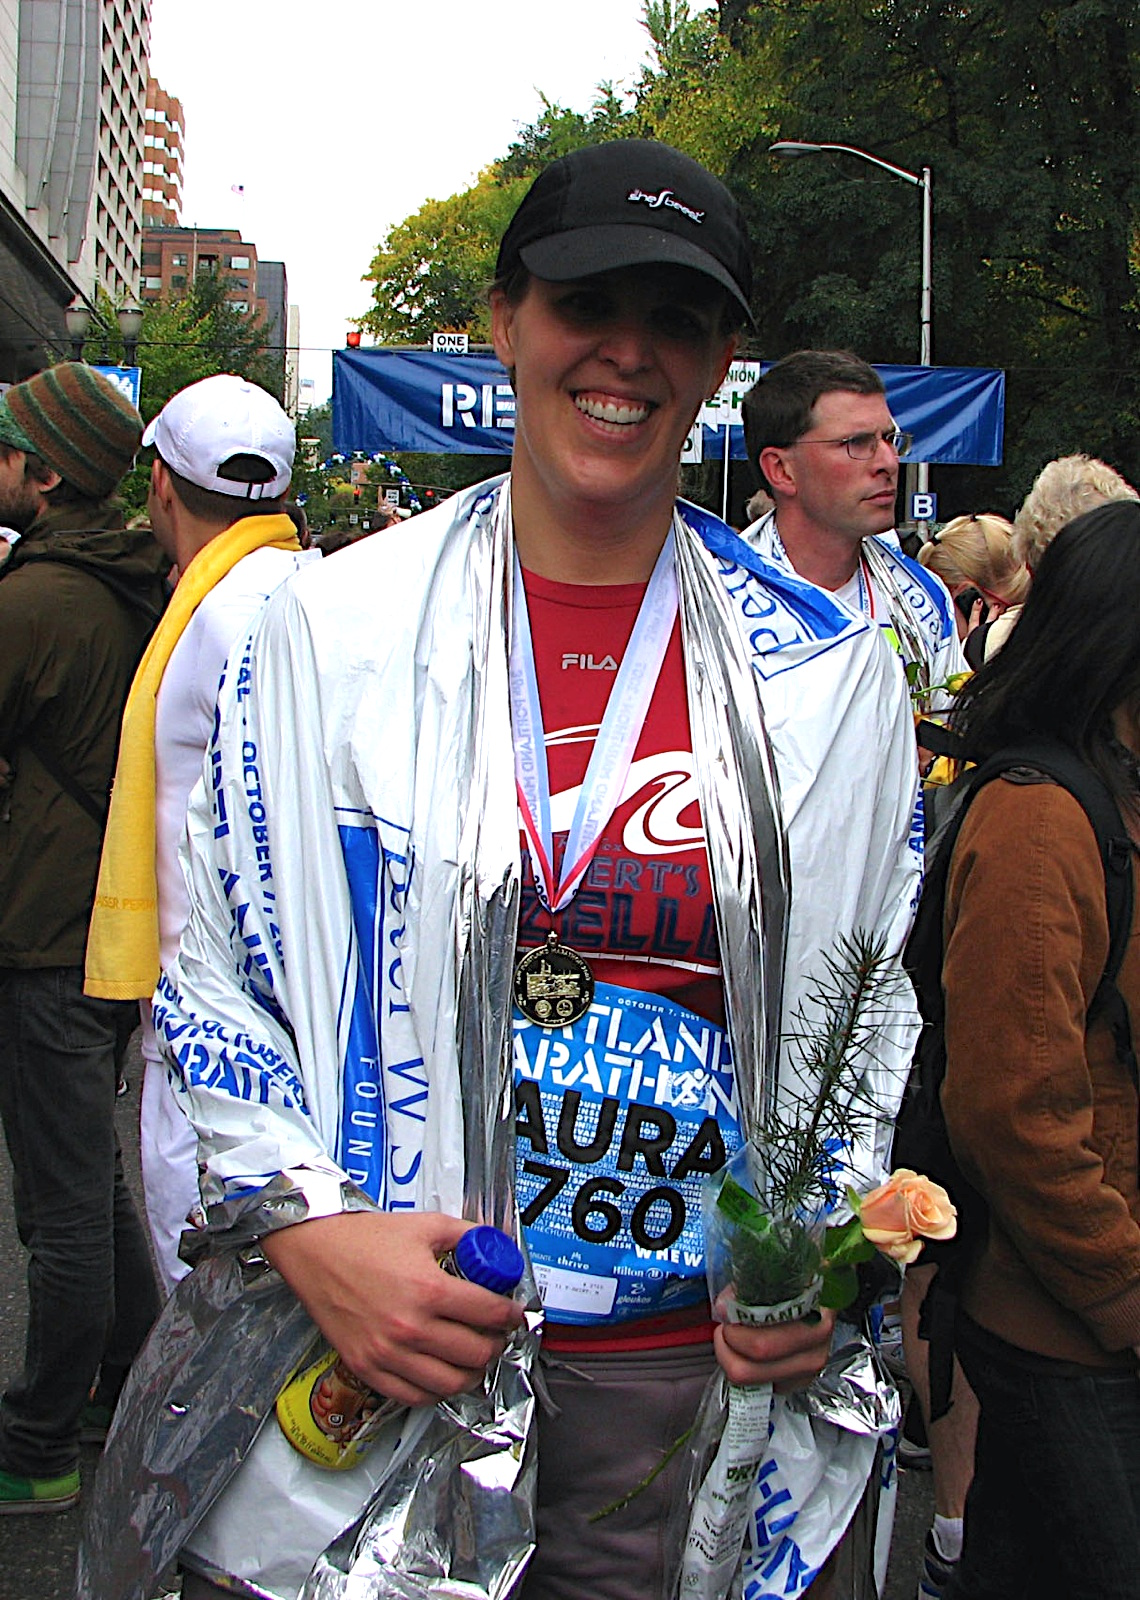 Marathon finish in Portland 2007